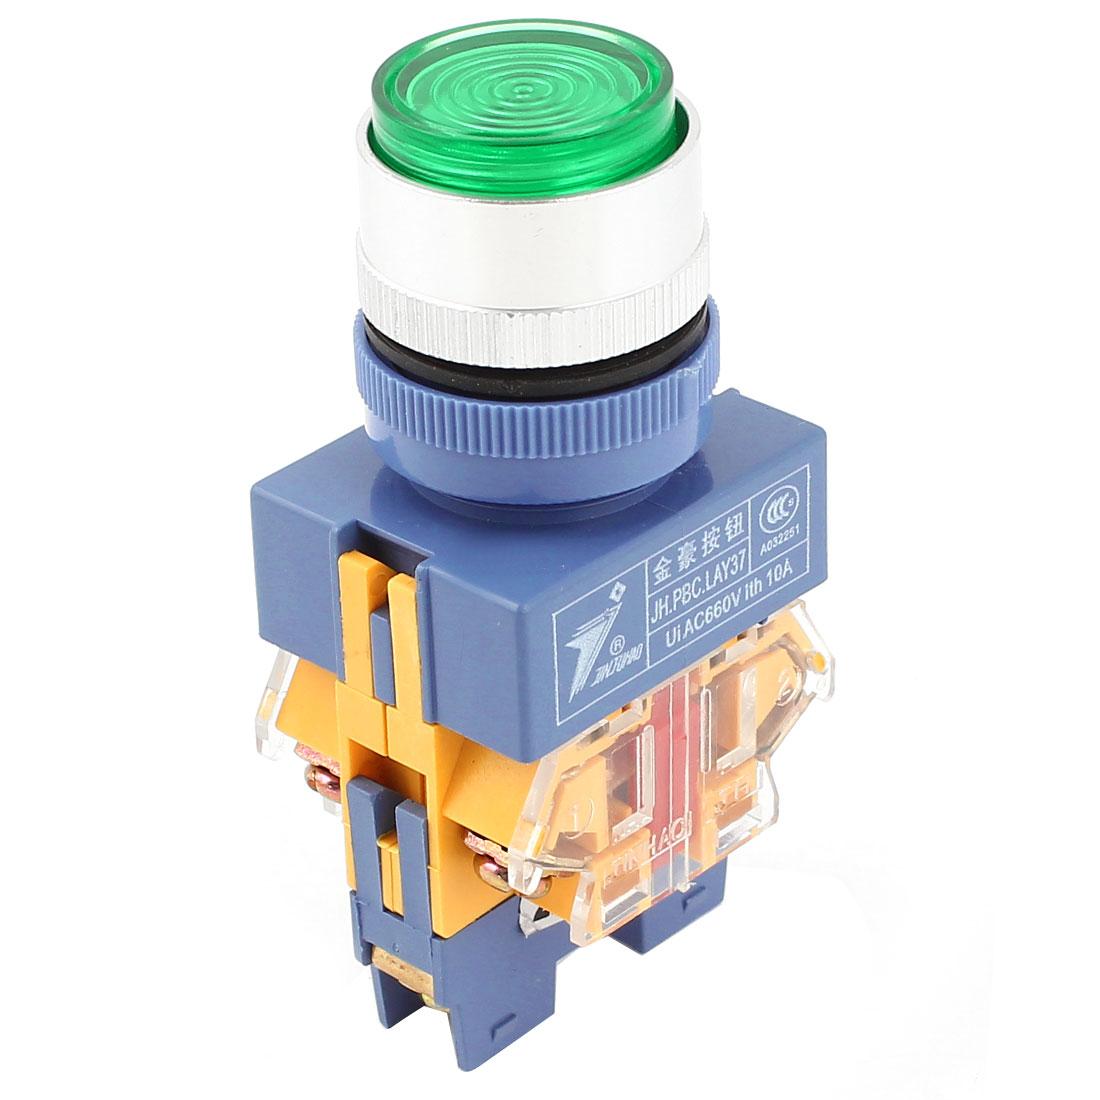 Green Pilot Lamp 1NC 1NO 6-Terminal Ui AC 600V Ith 10A Pushbutton Switch AC 220V